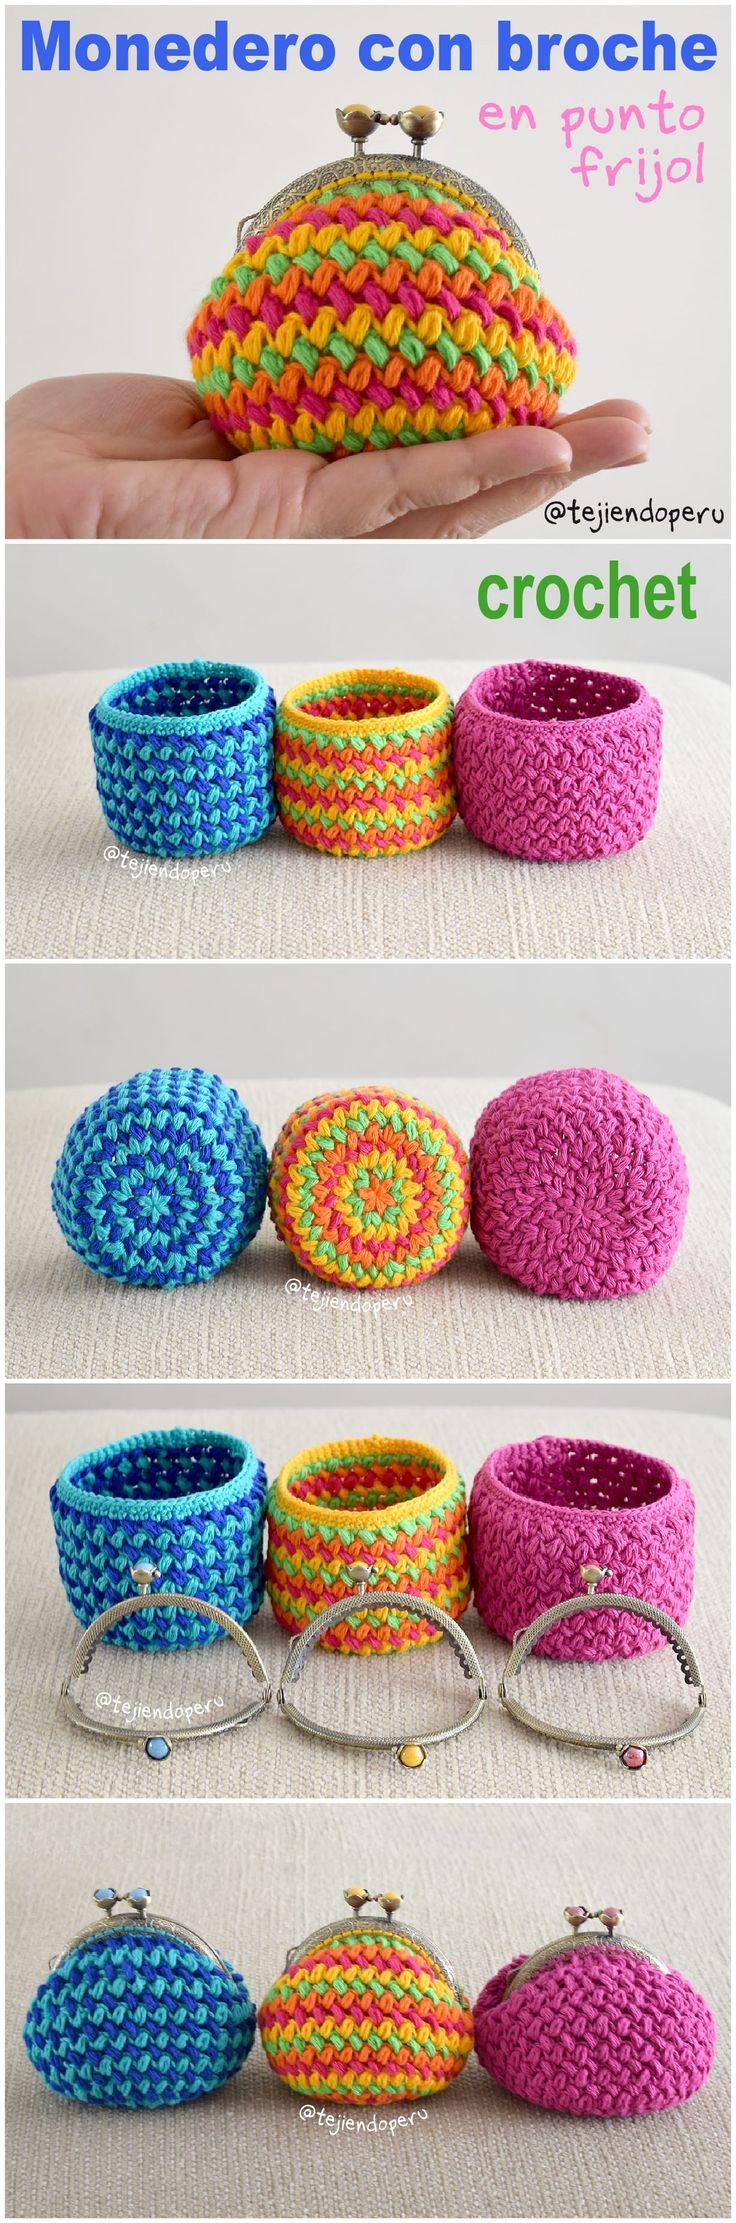 Crochet: Monederos con broche tejidosten punto frijol o bean stitch en forma circular paso a paso en video! ✿ƬⱤღ https://www.pinterest.com/teretegui/